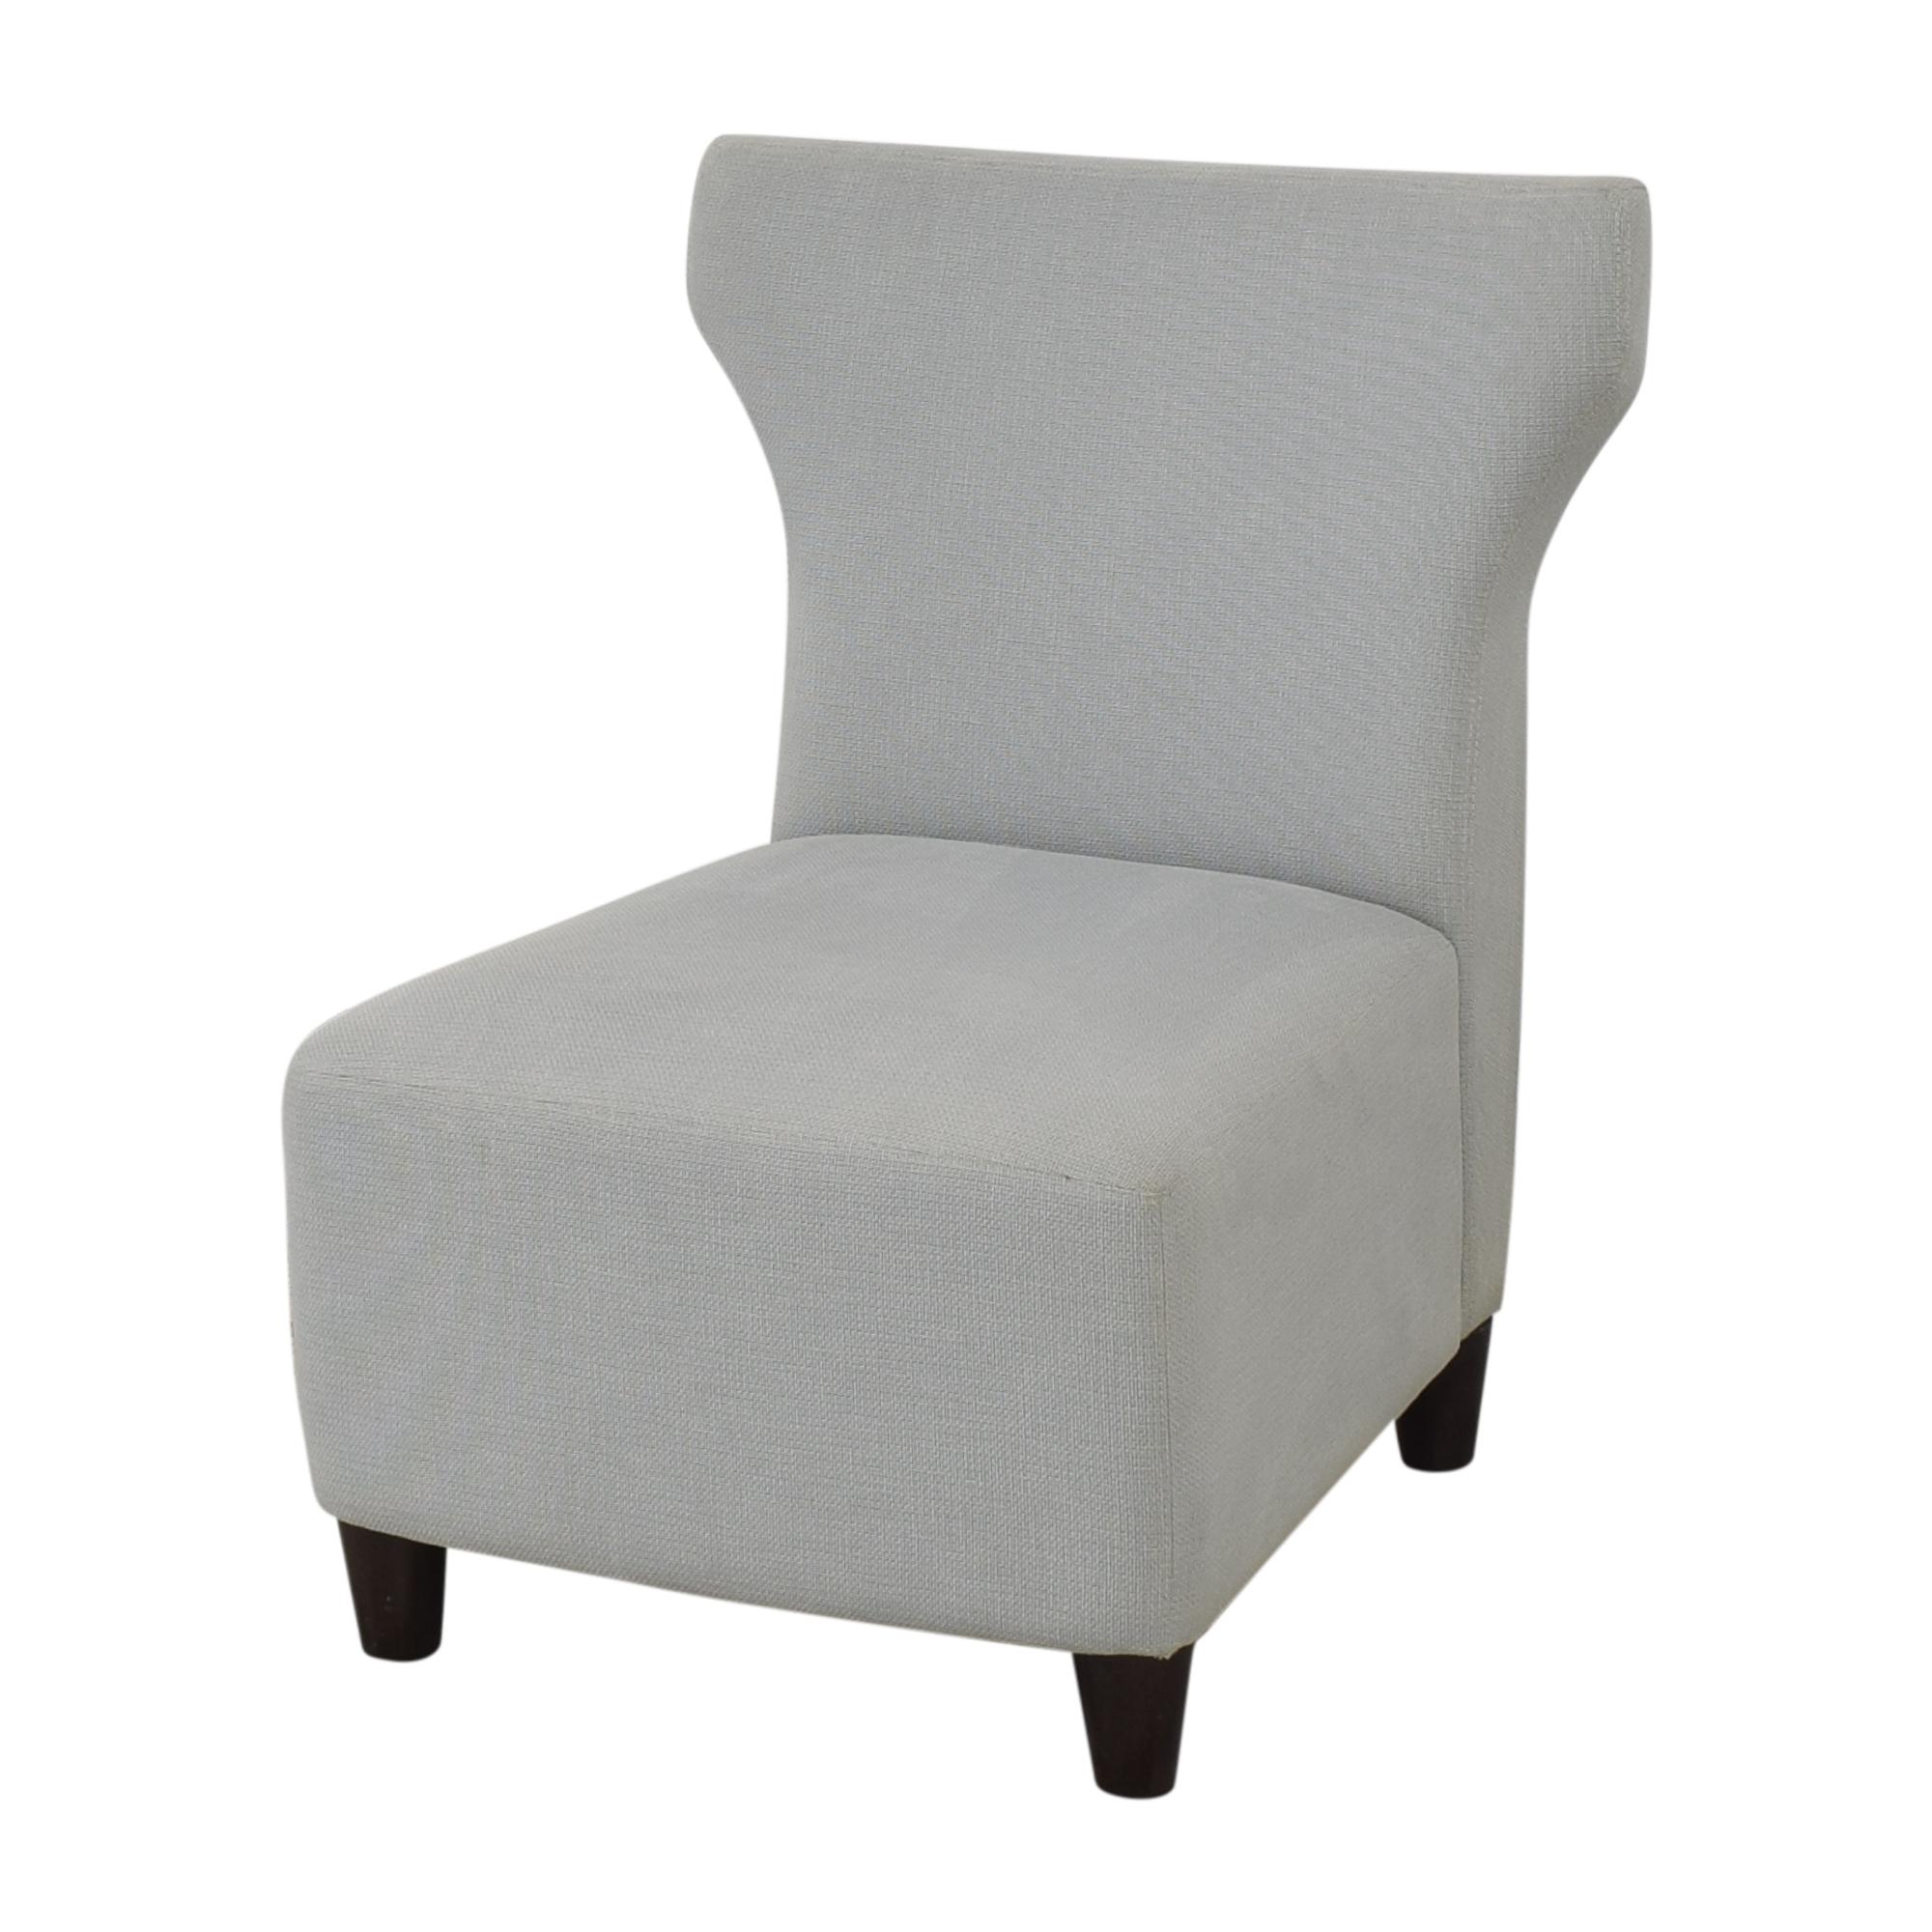 West Elm West Elm Modern Sitting Room Chair